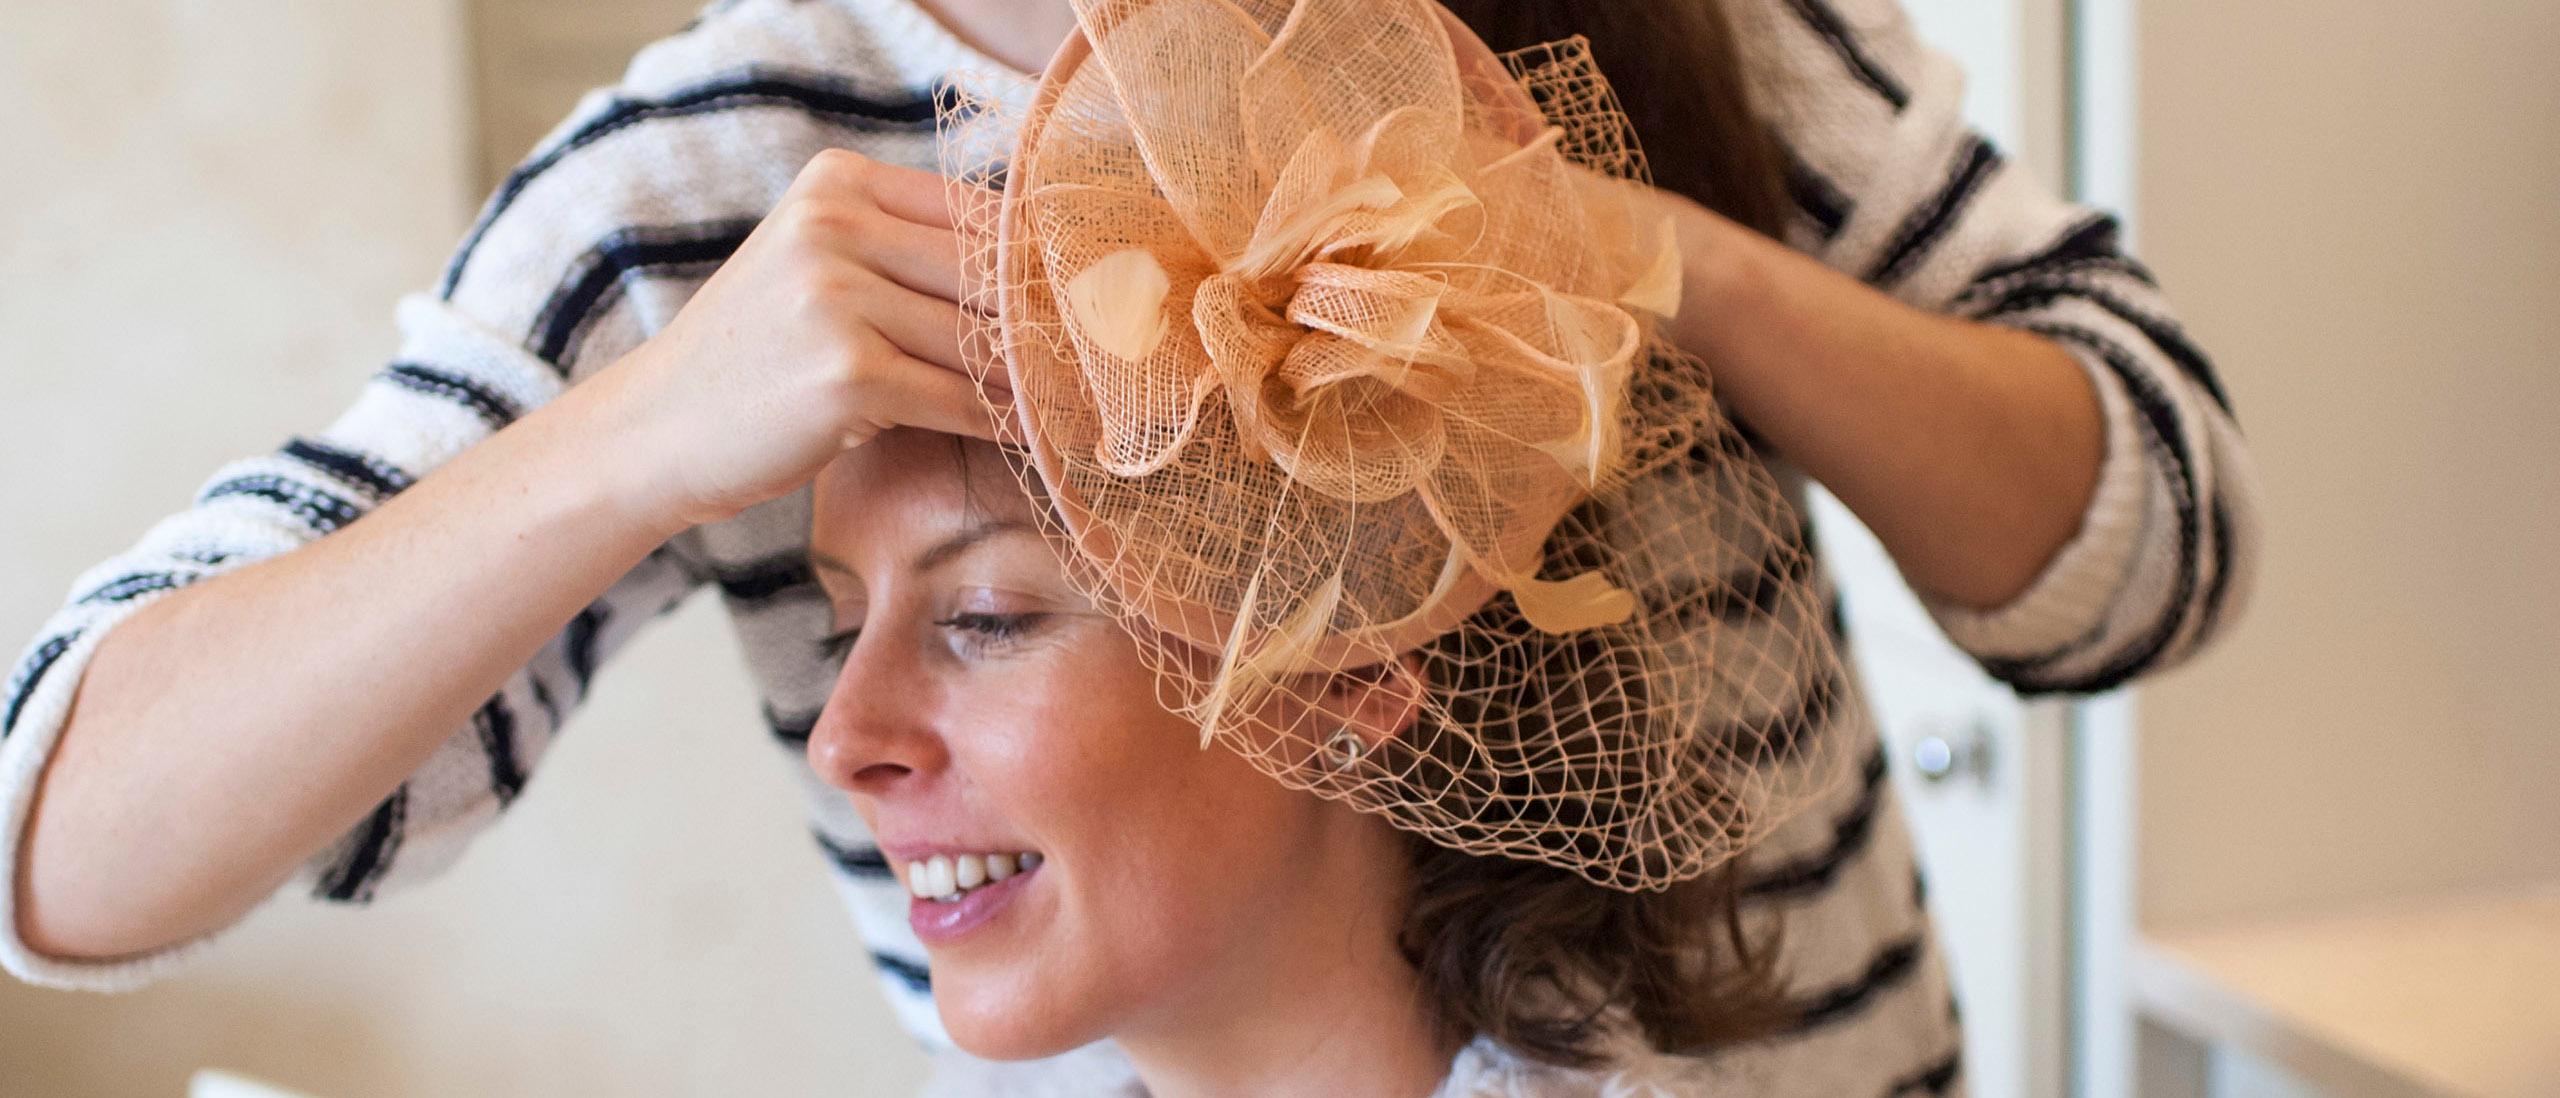 Host Spotlight: Ten Top Tips on Hat-Etiquette from Millinery Expert Sarah-Jayne